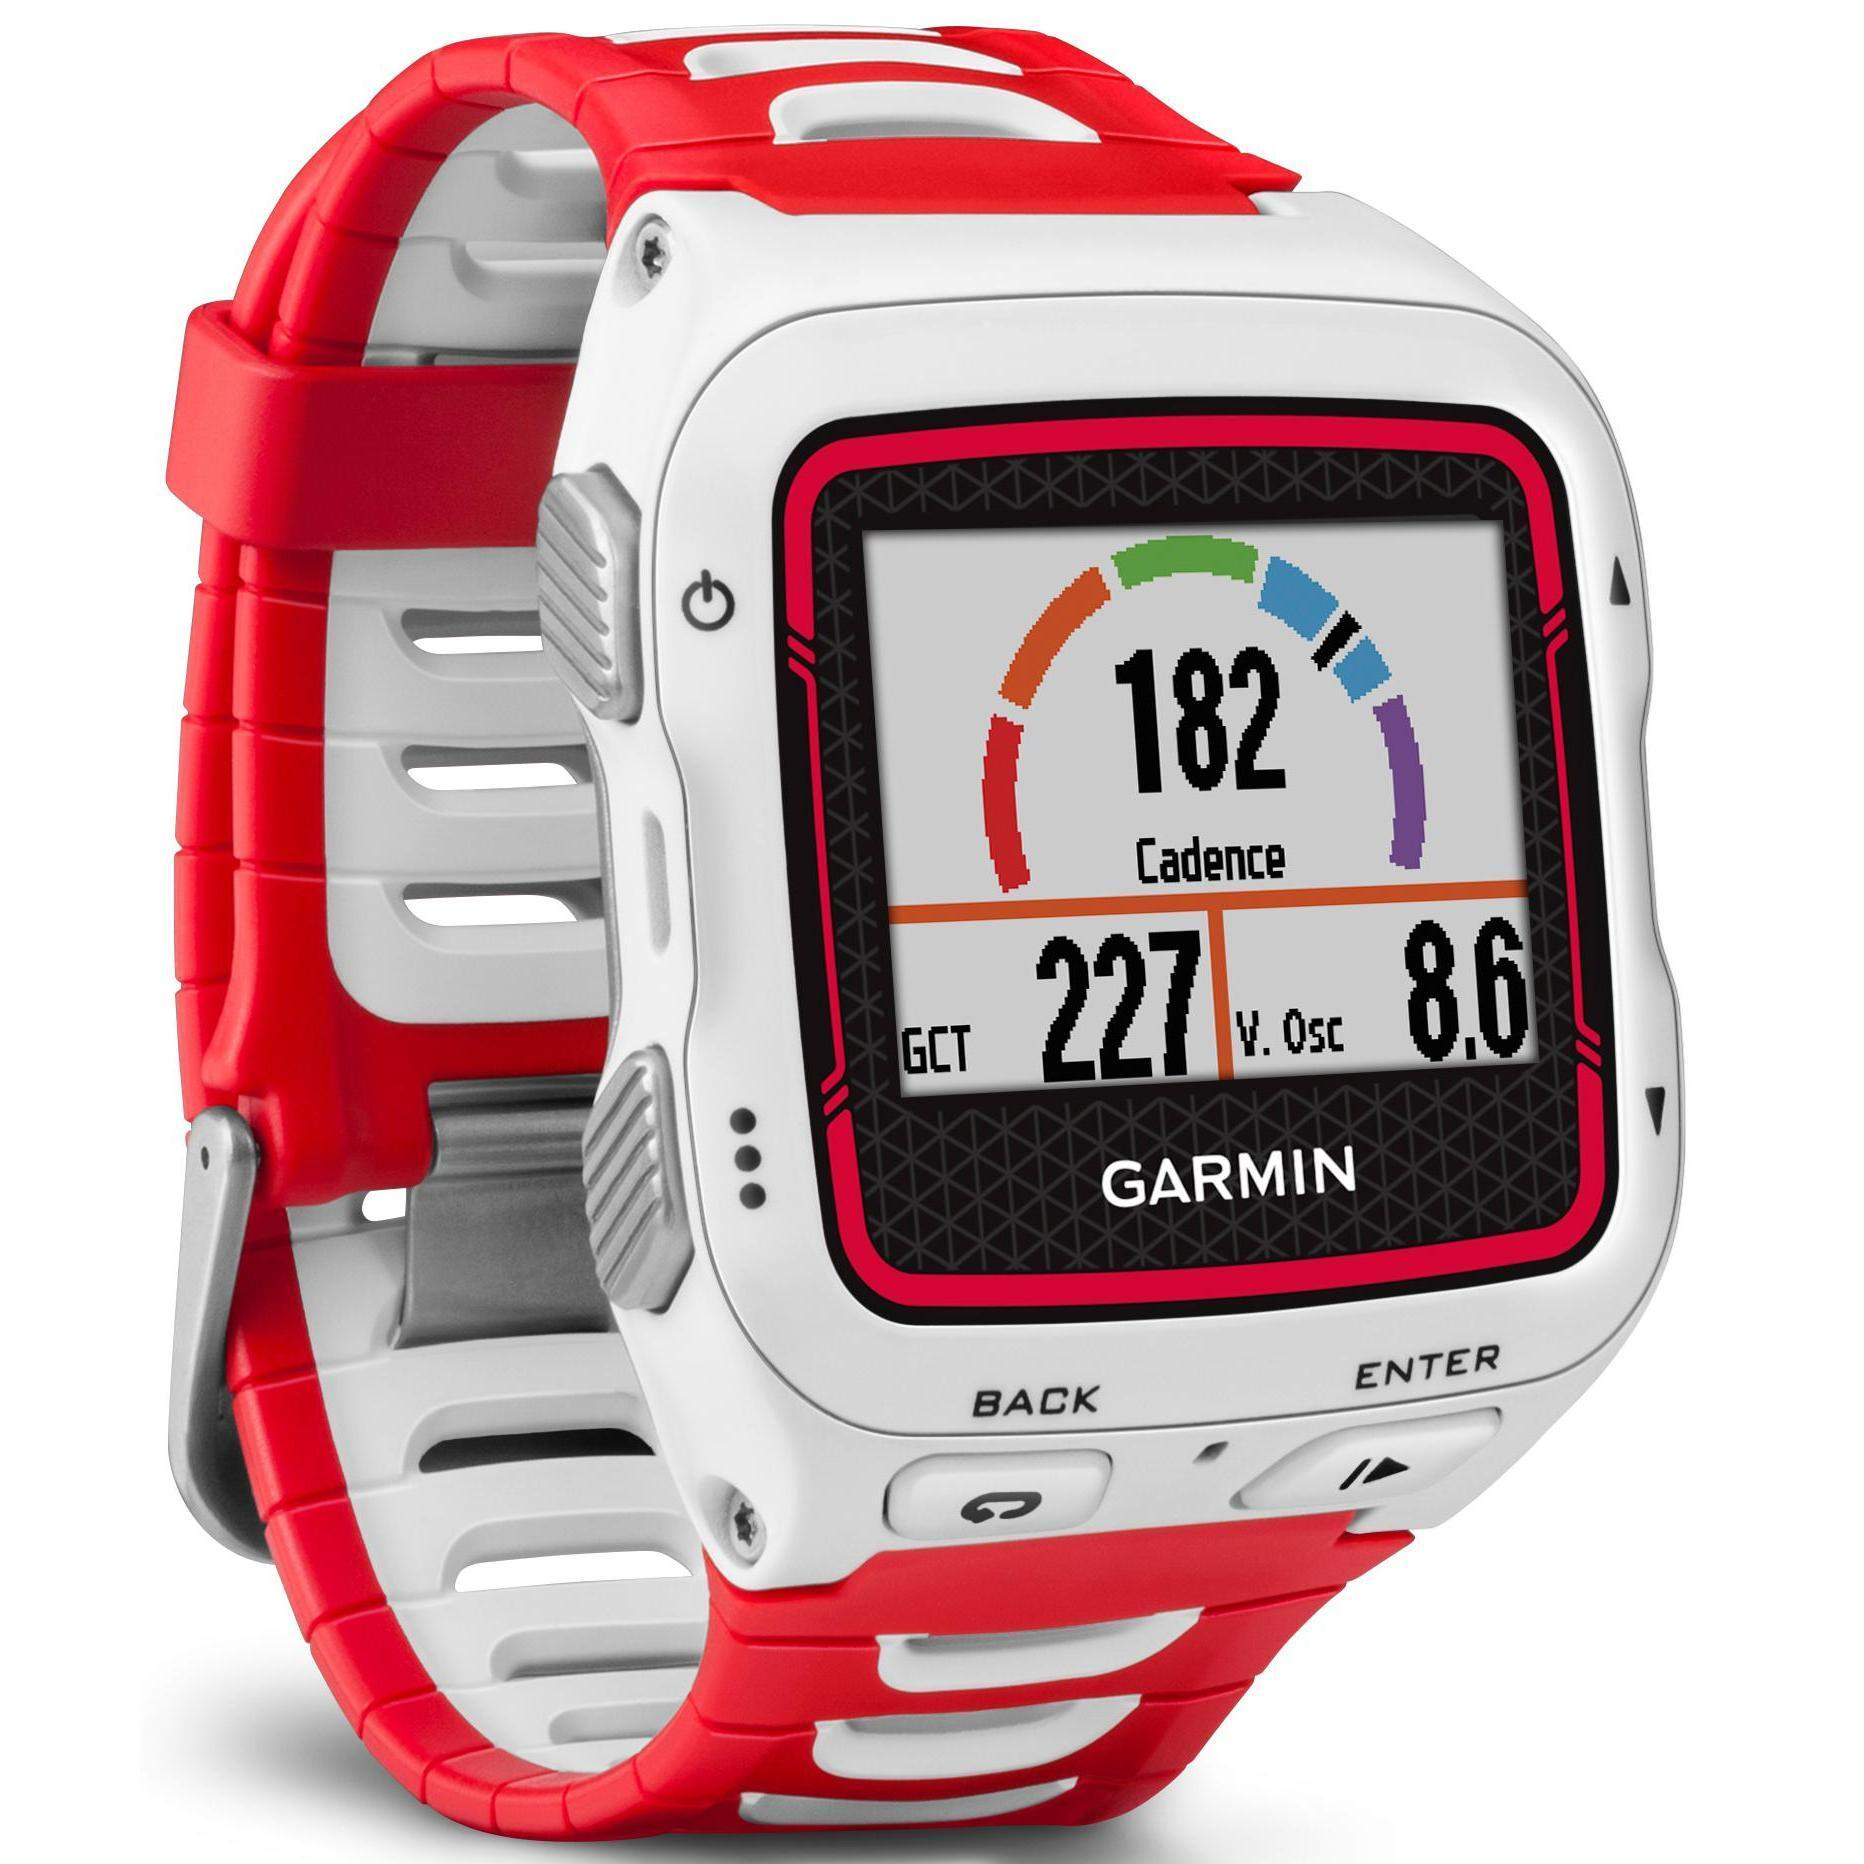 Reloj deportivo GARMIN Forerunner 920XT - Blanco Rojo